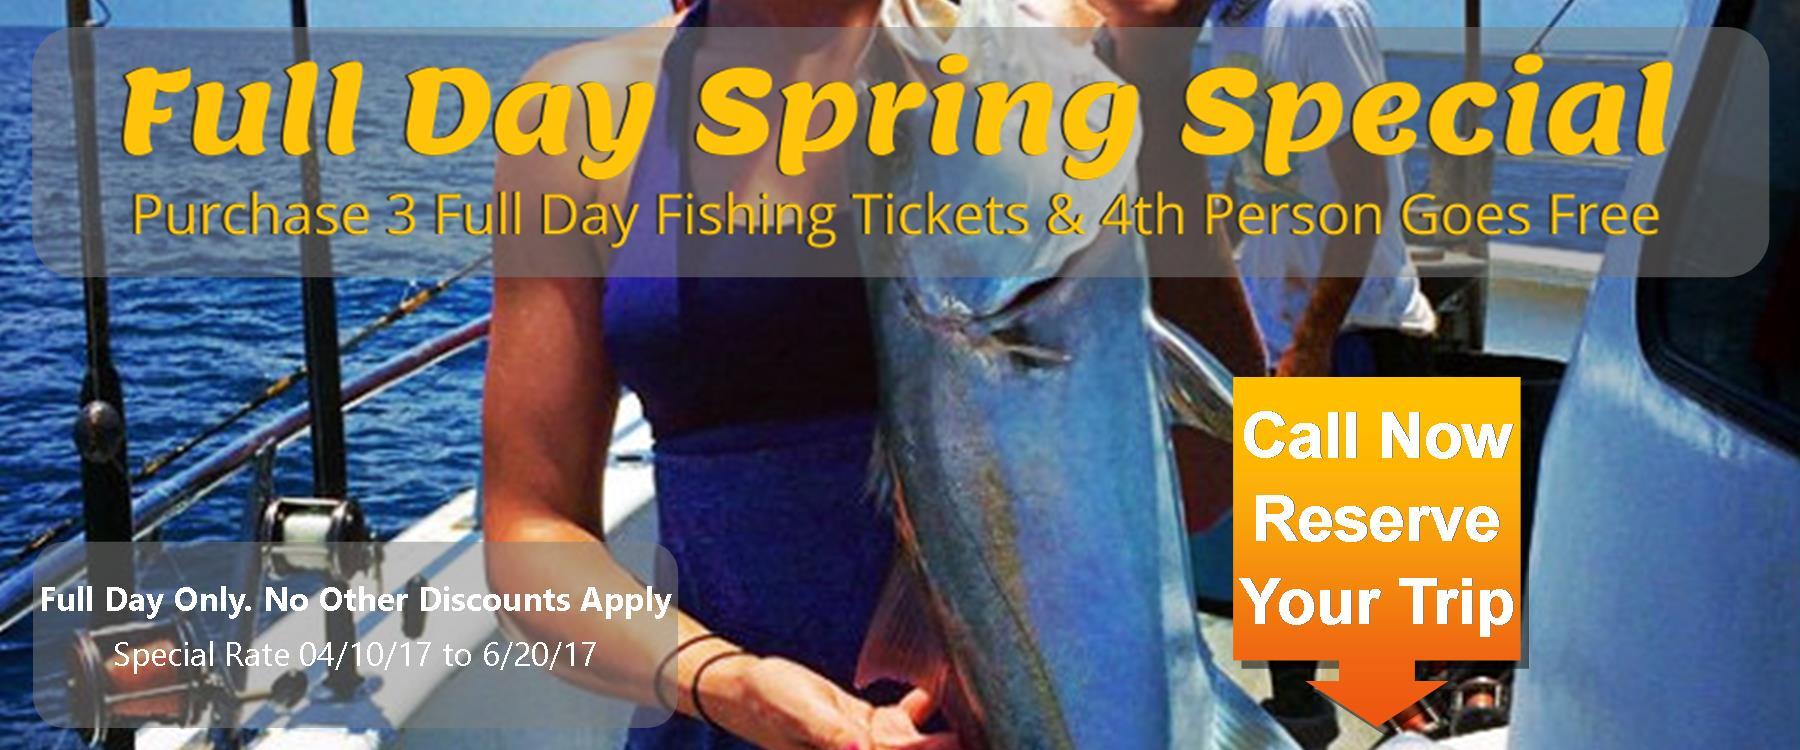 deep sea fishing coupon deal